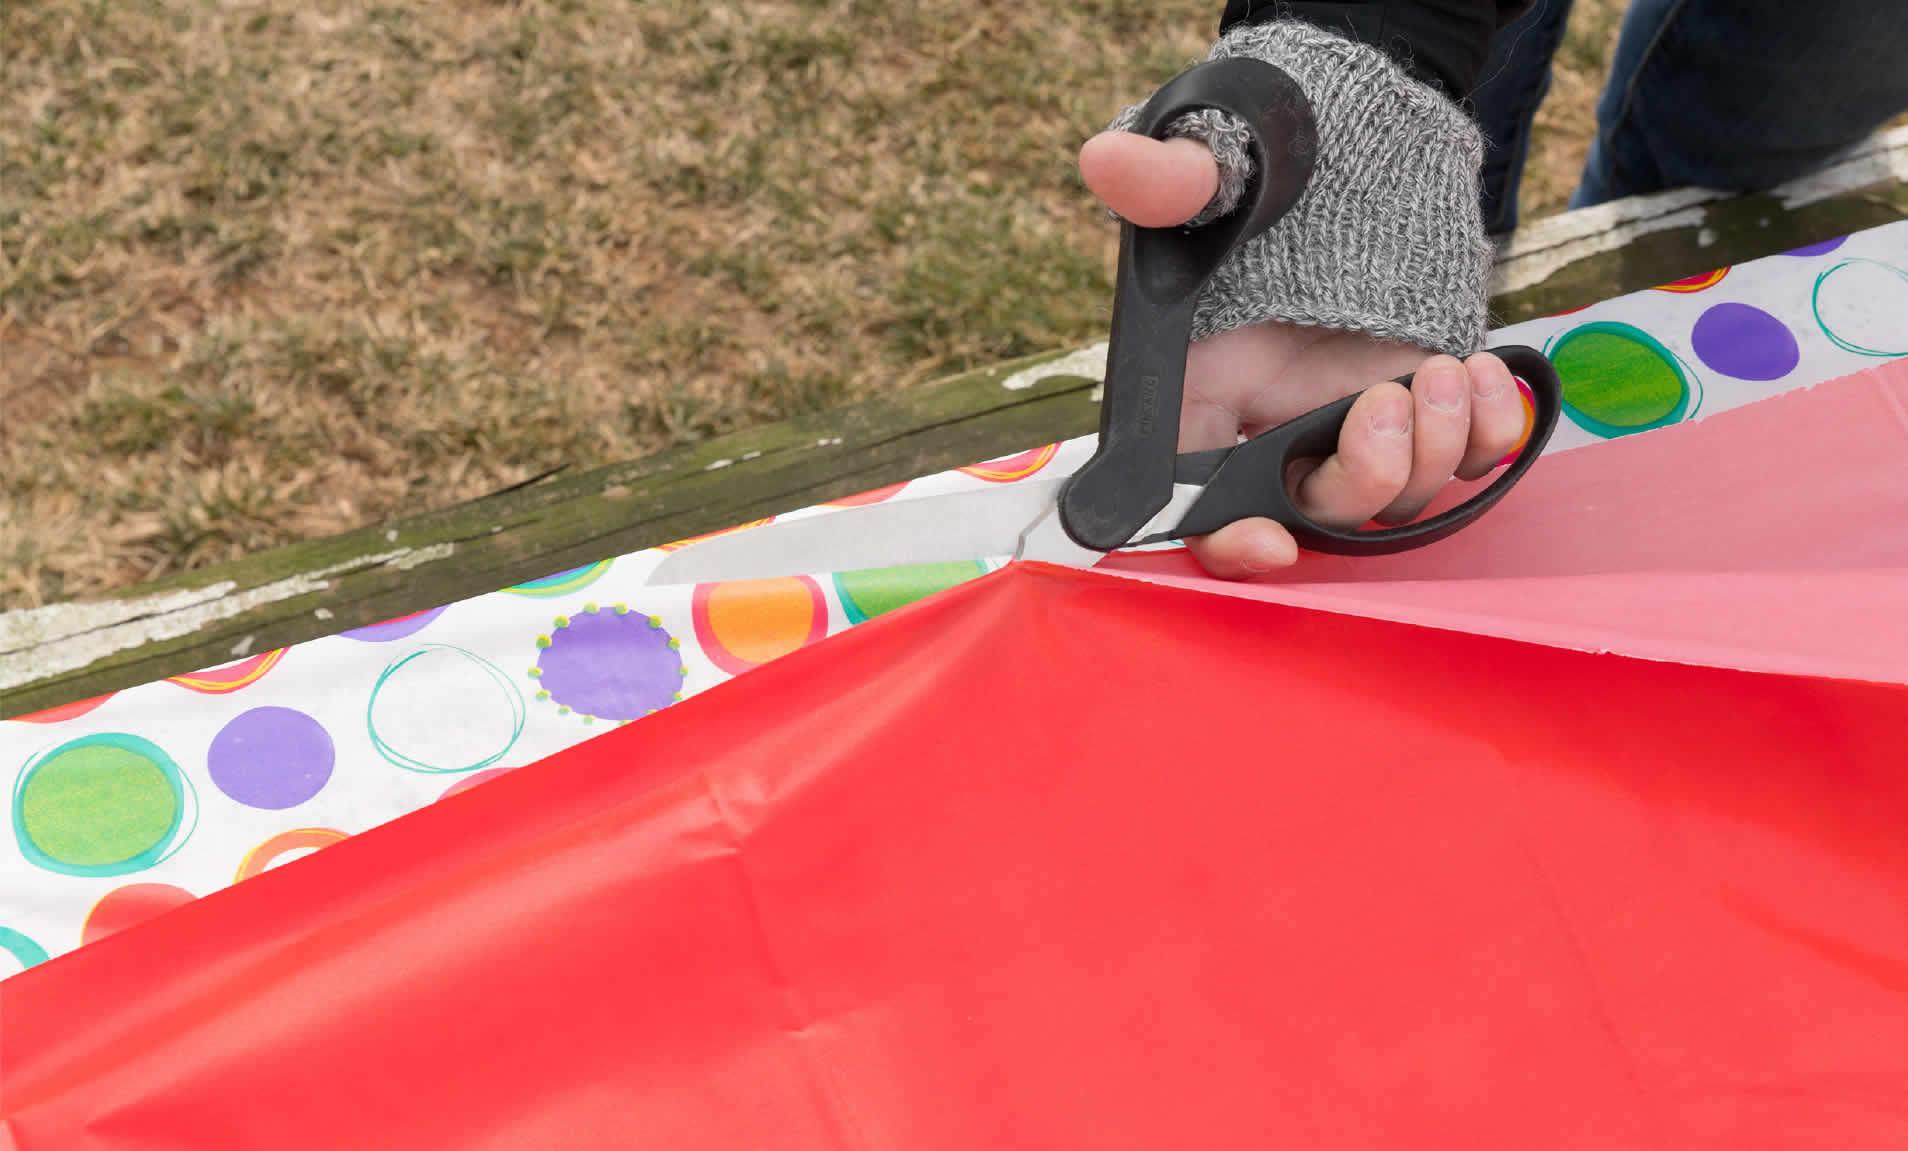 picnic-table-cushion-arrow-project-step2a